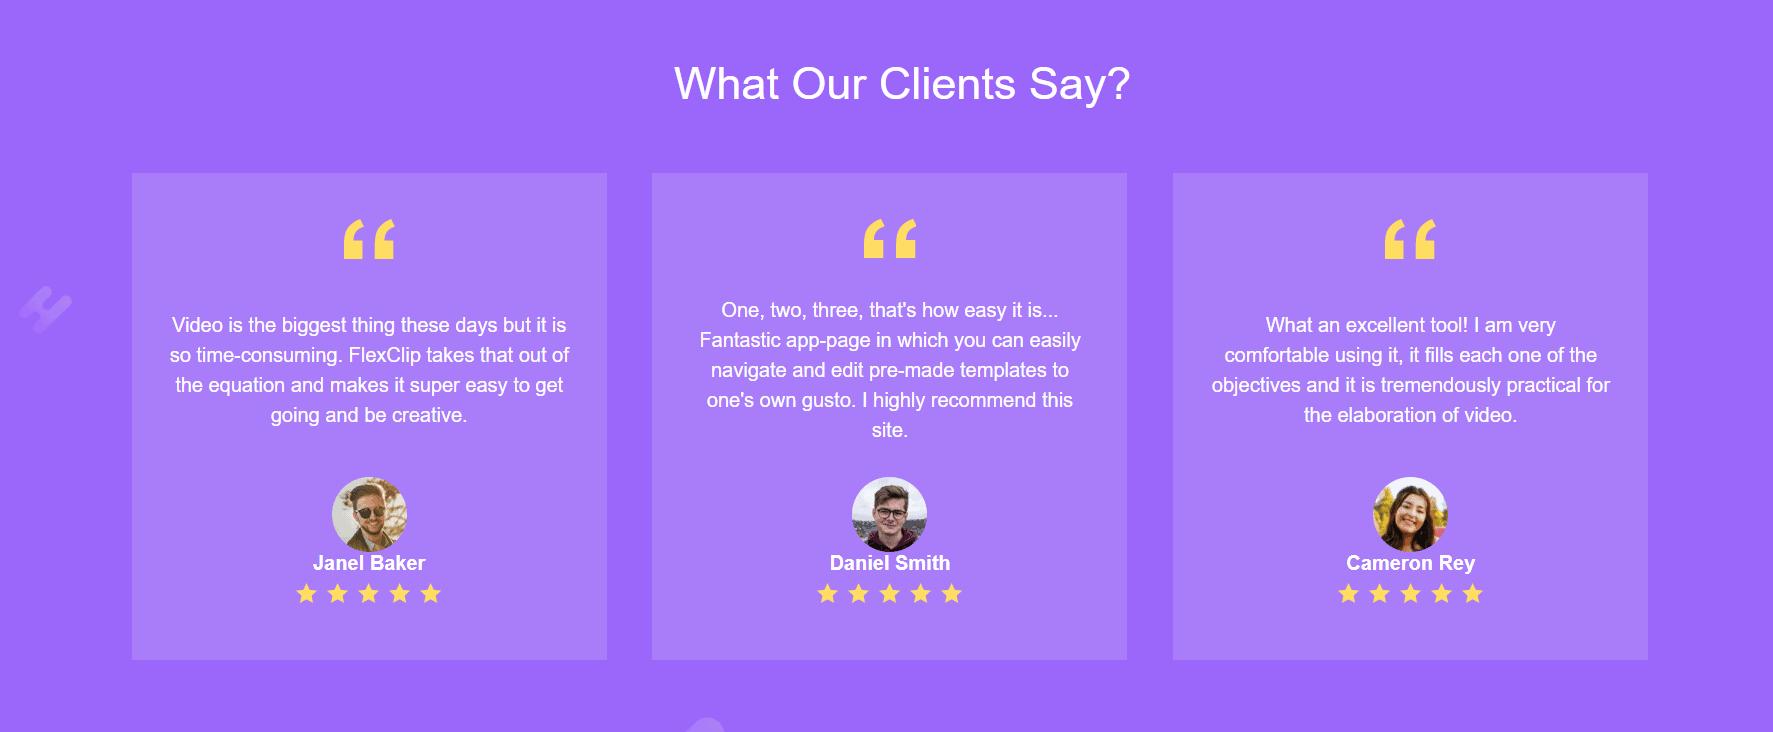 Flexclip testimonials